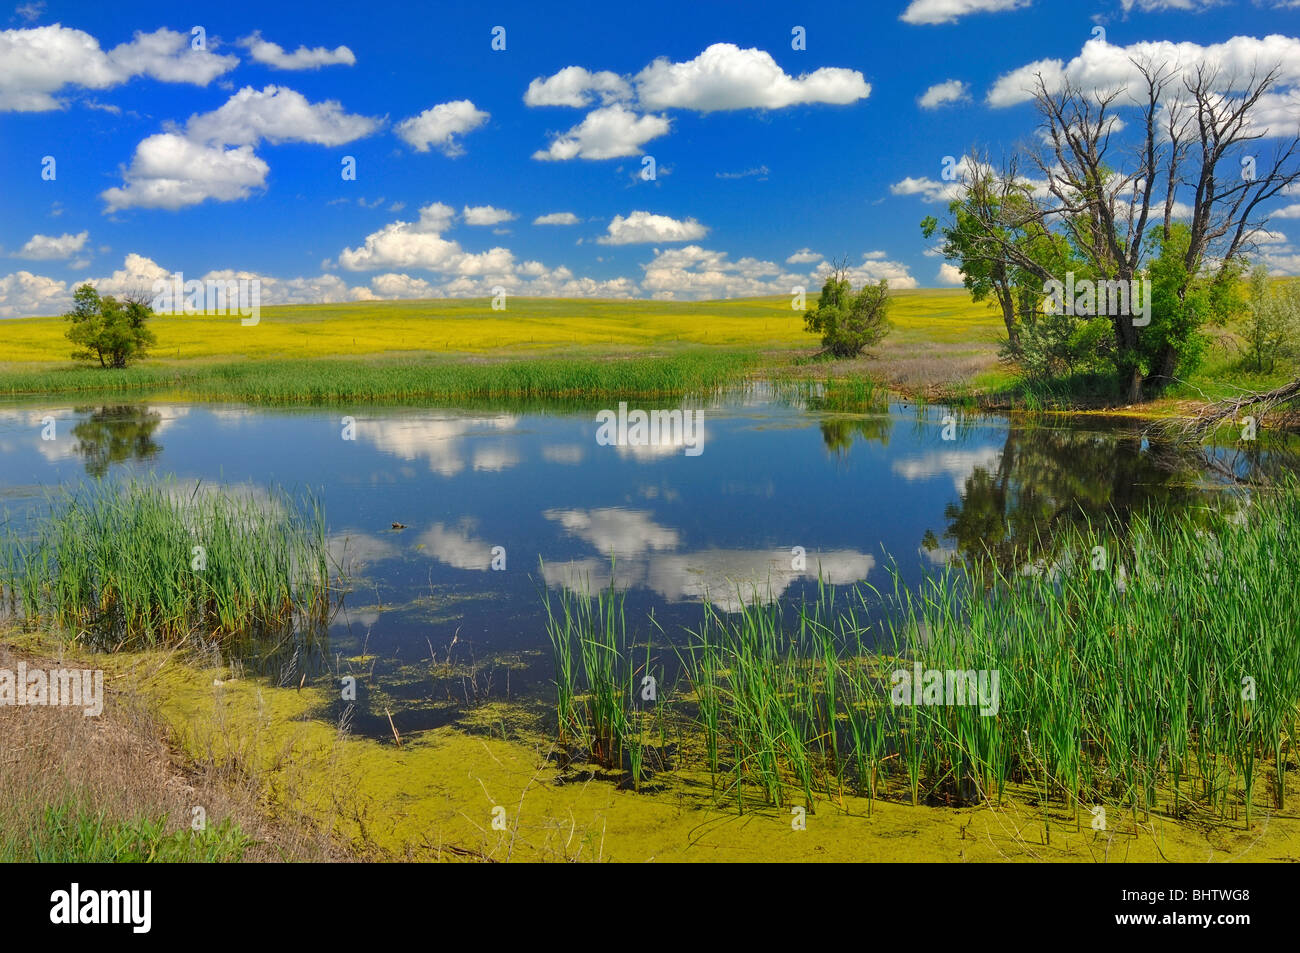 The Pioneer Picnic Ground at Buffalo Gap National Grassland in Nebraska,  United States of America Stock Photo